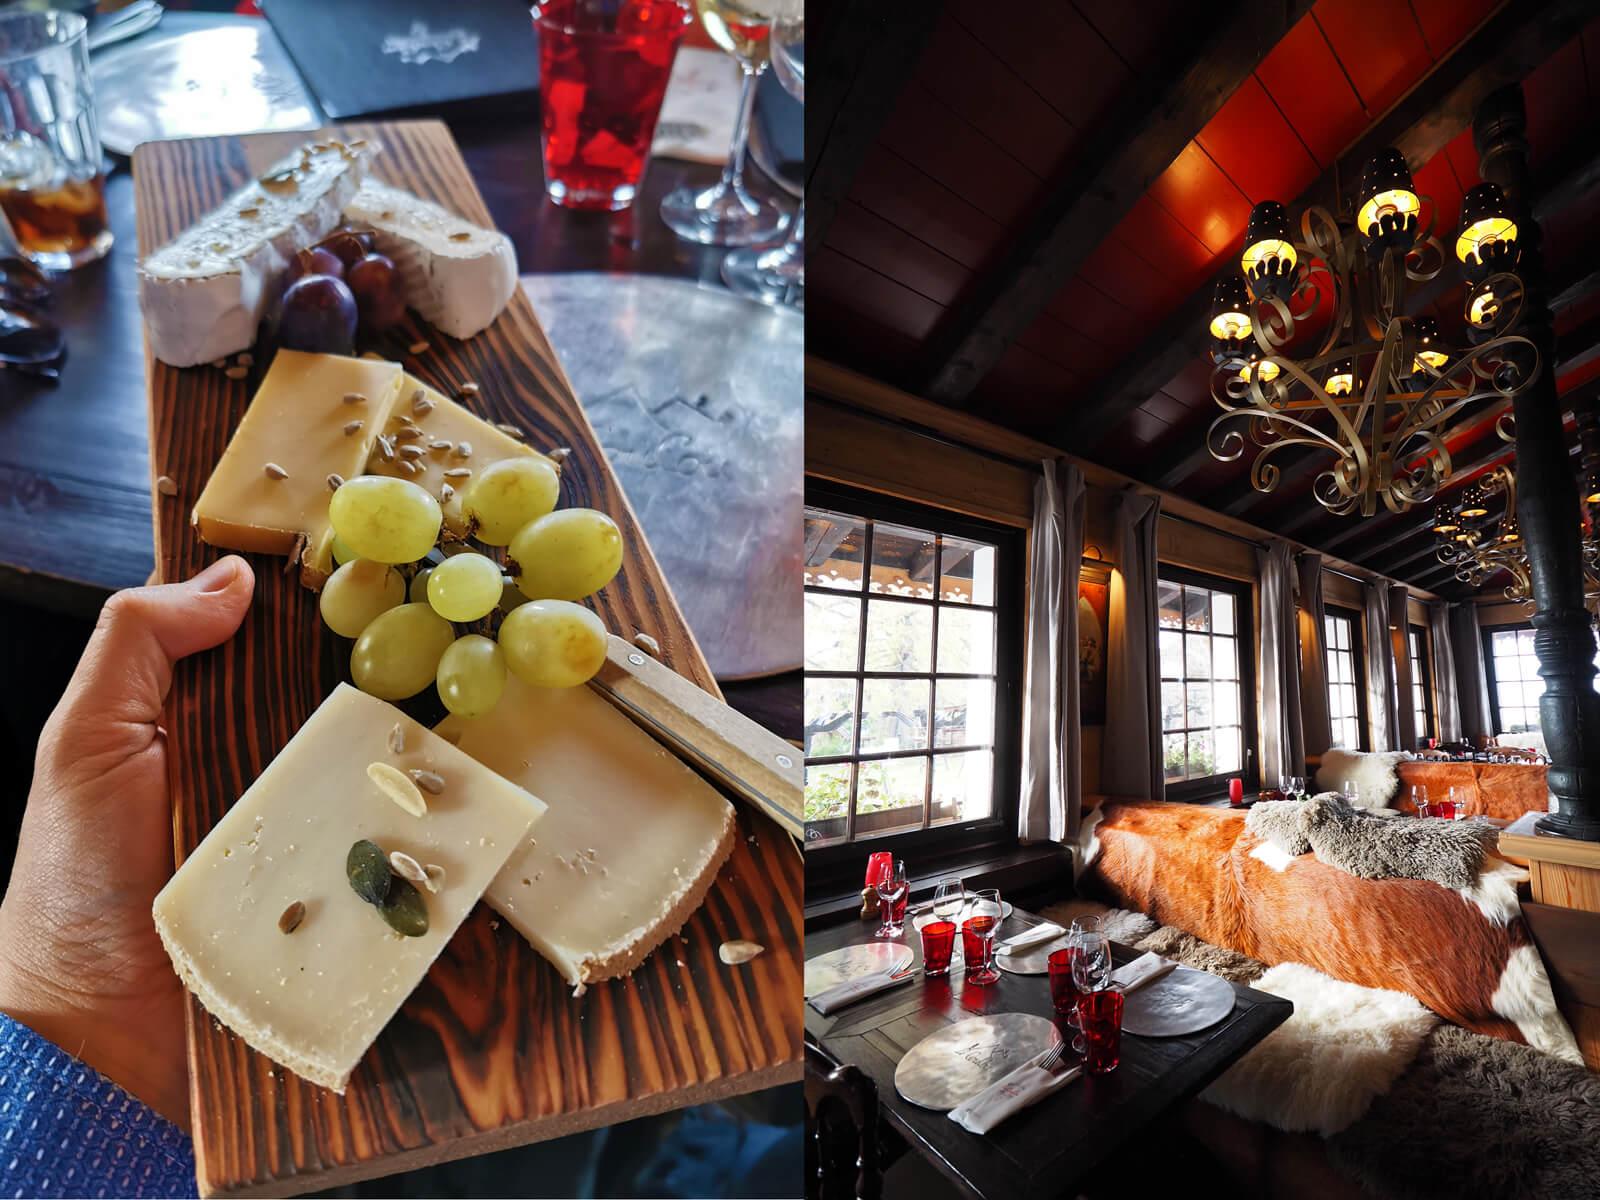 Restaurant Le CouCou in Glion